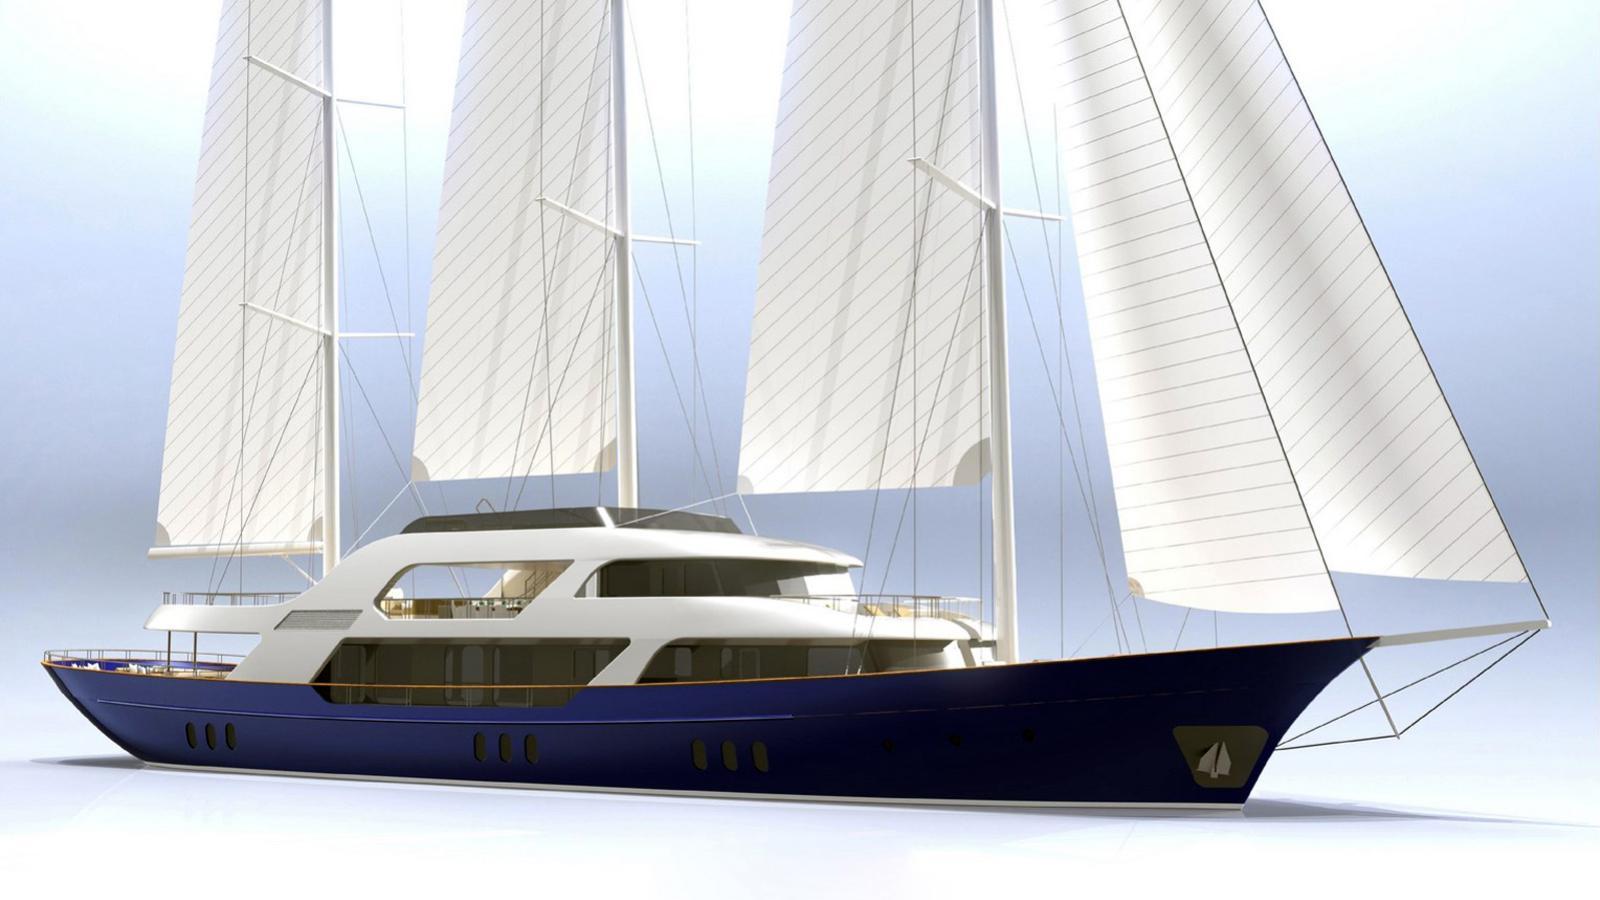 meira motorsailer neta marine 55m 2018 rendering